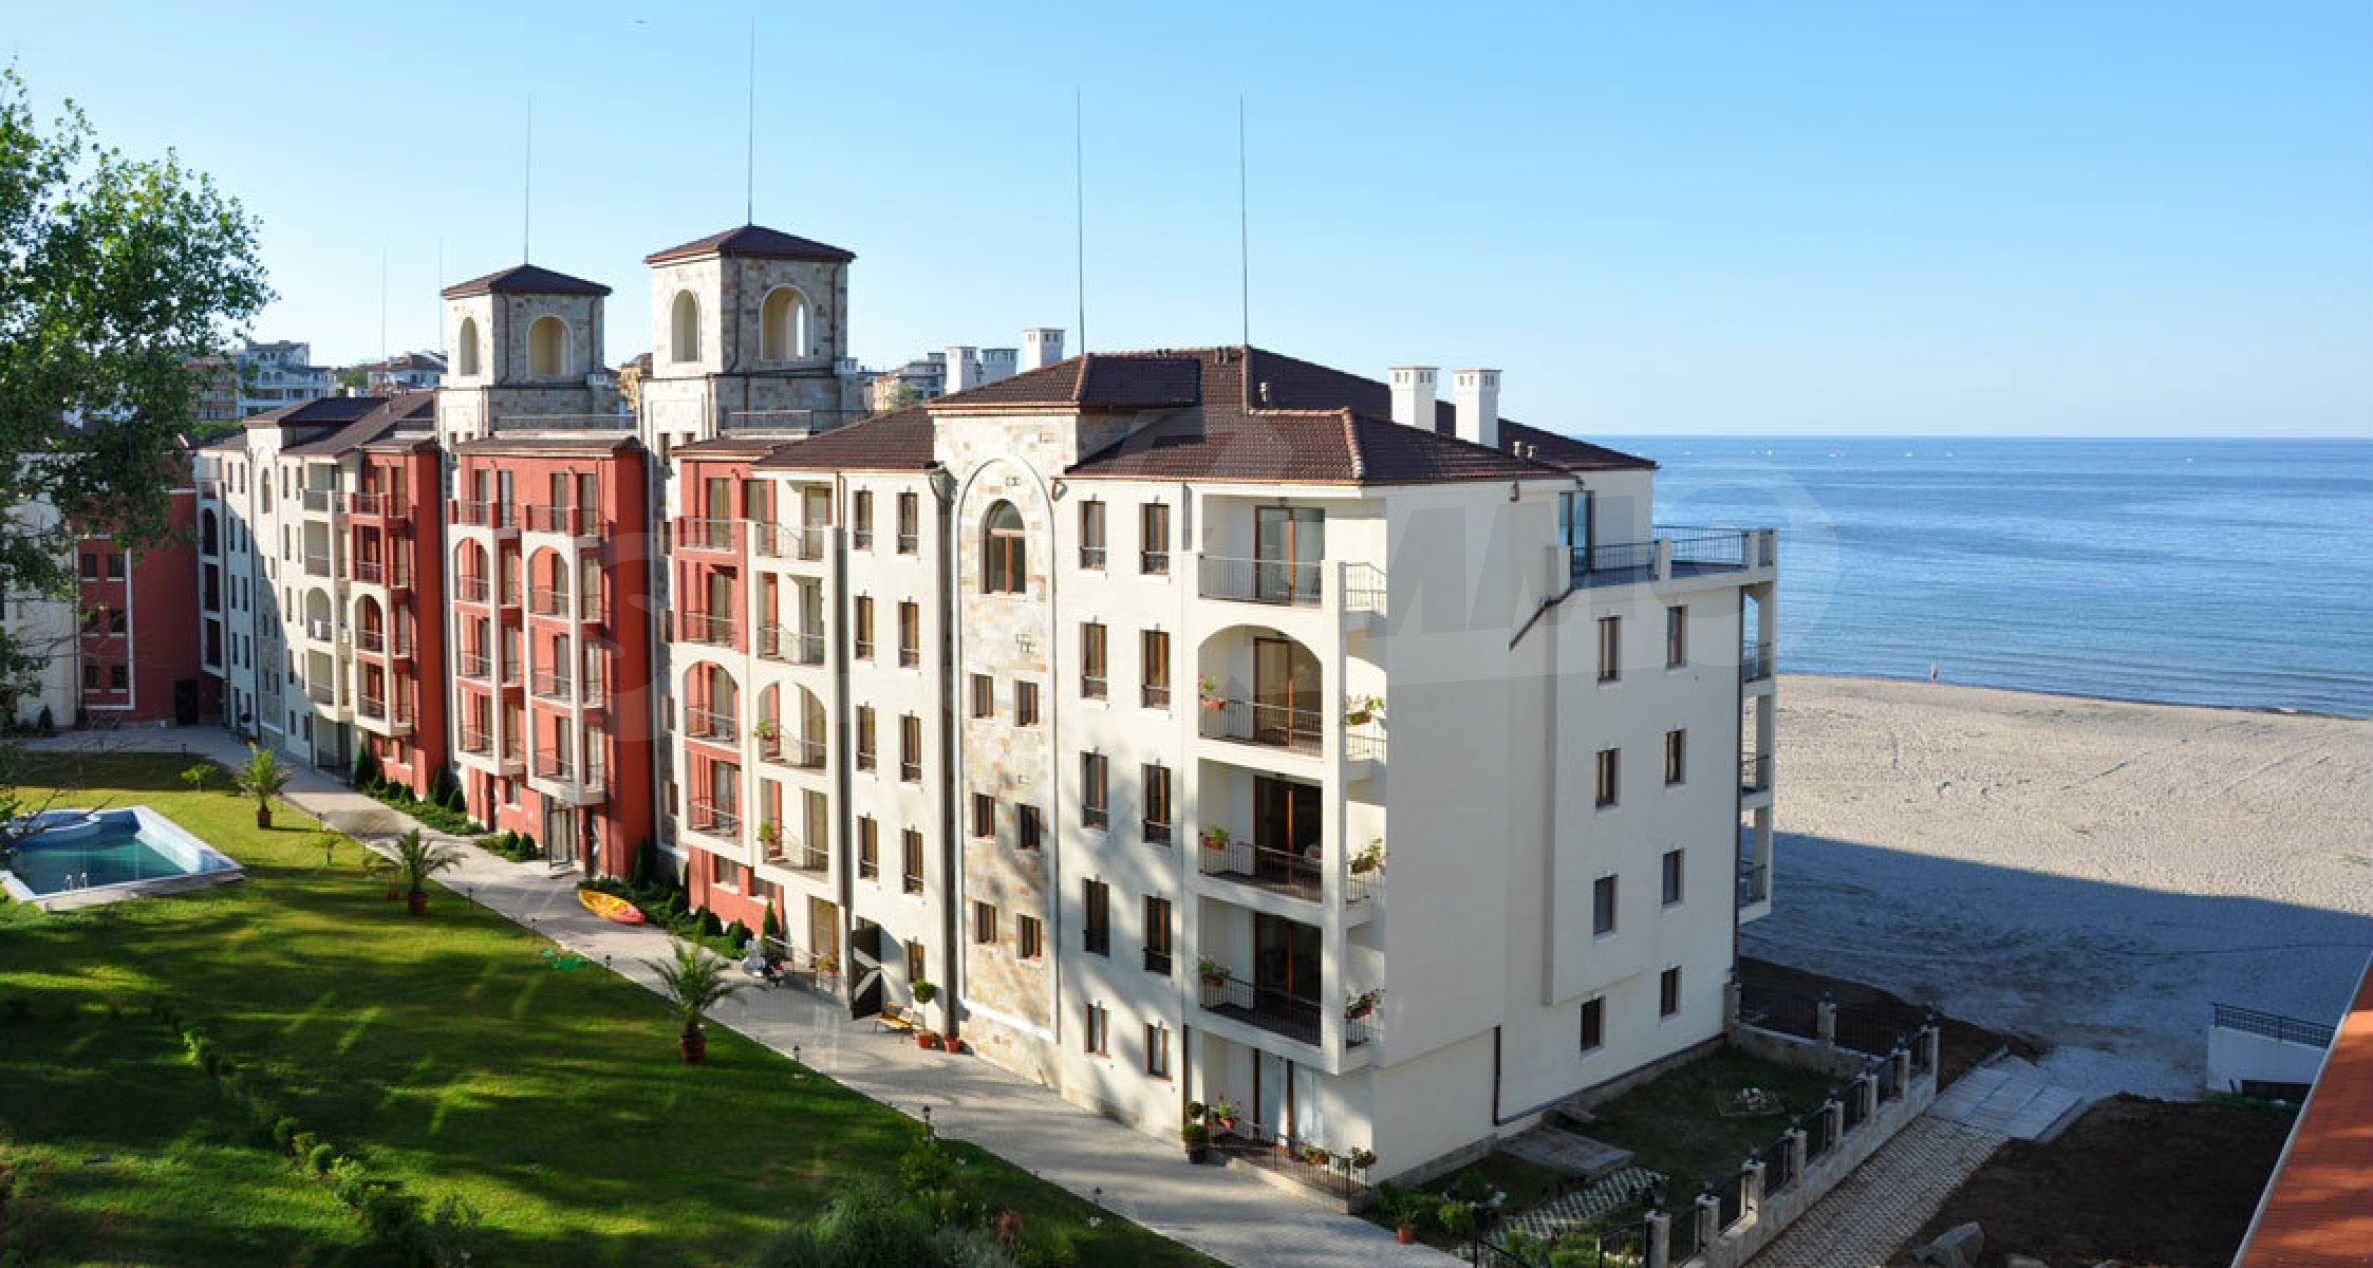 Примеа Бийч Резиденс / Primea Beach Residence